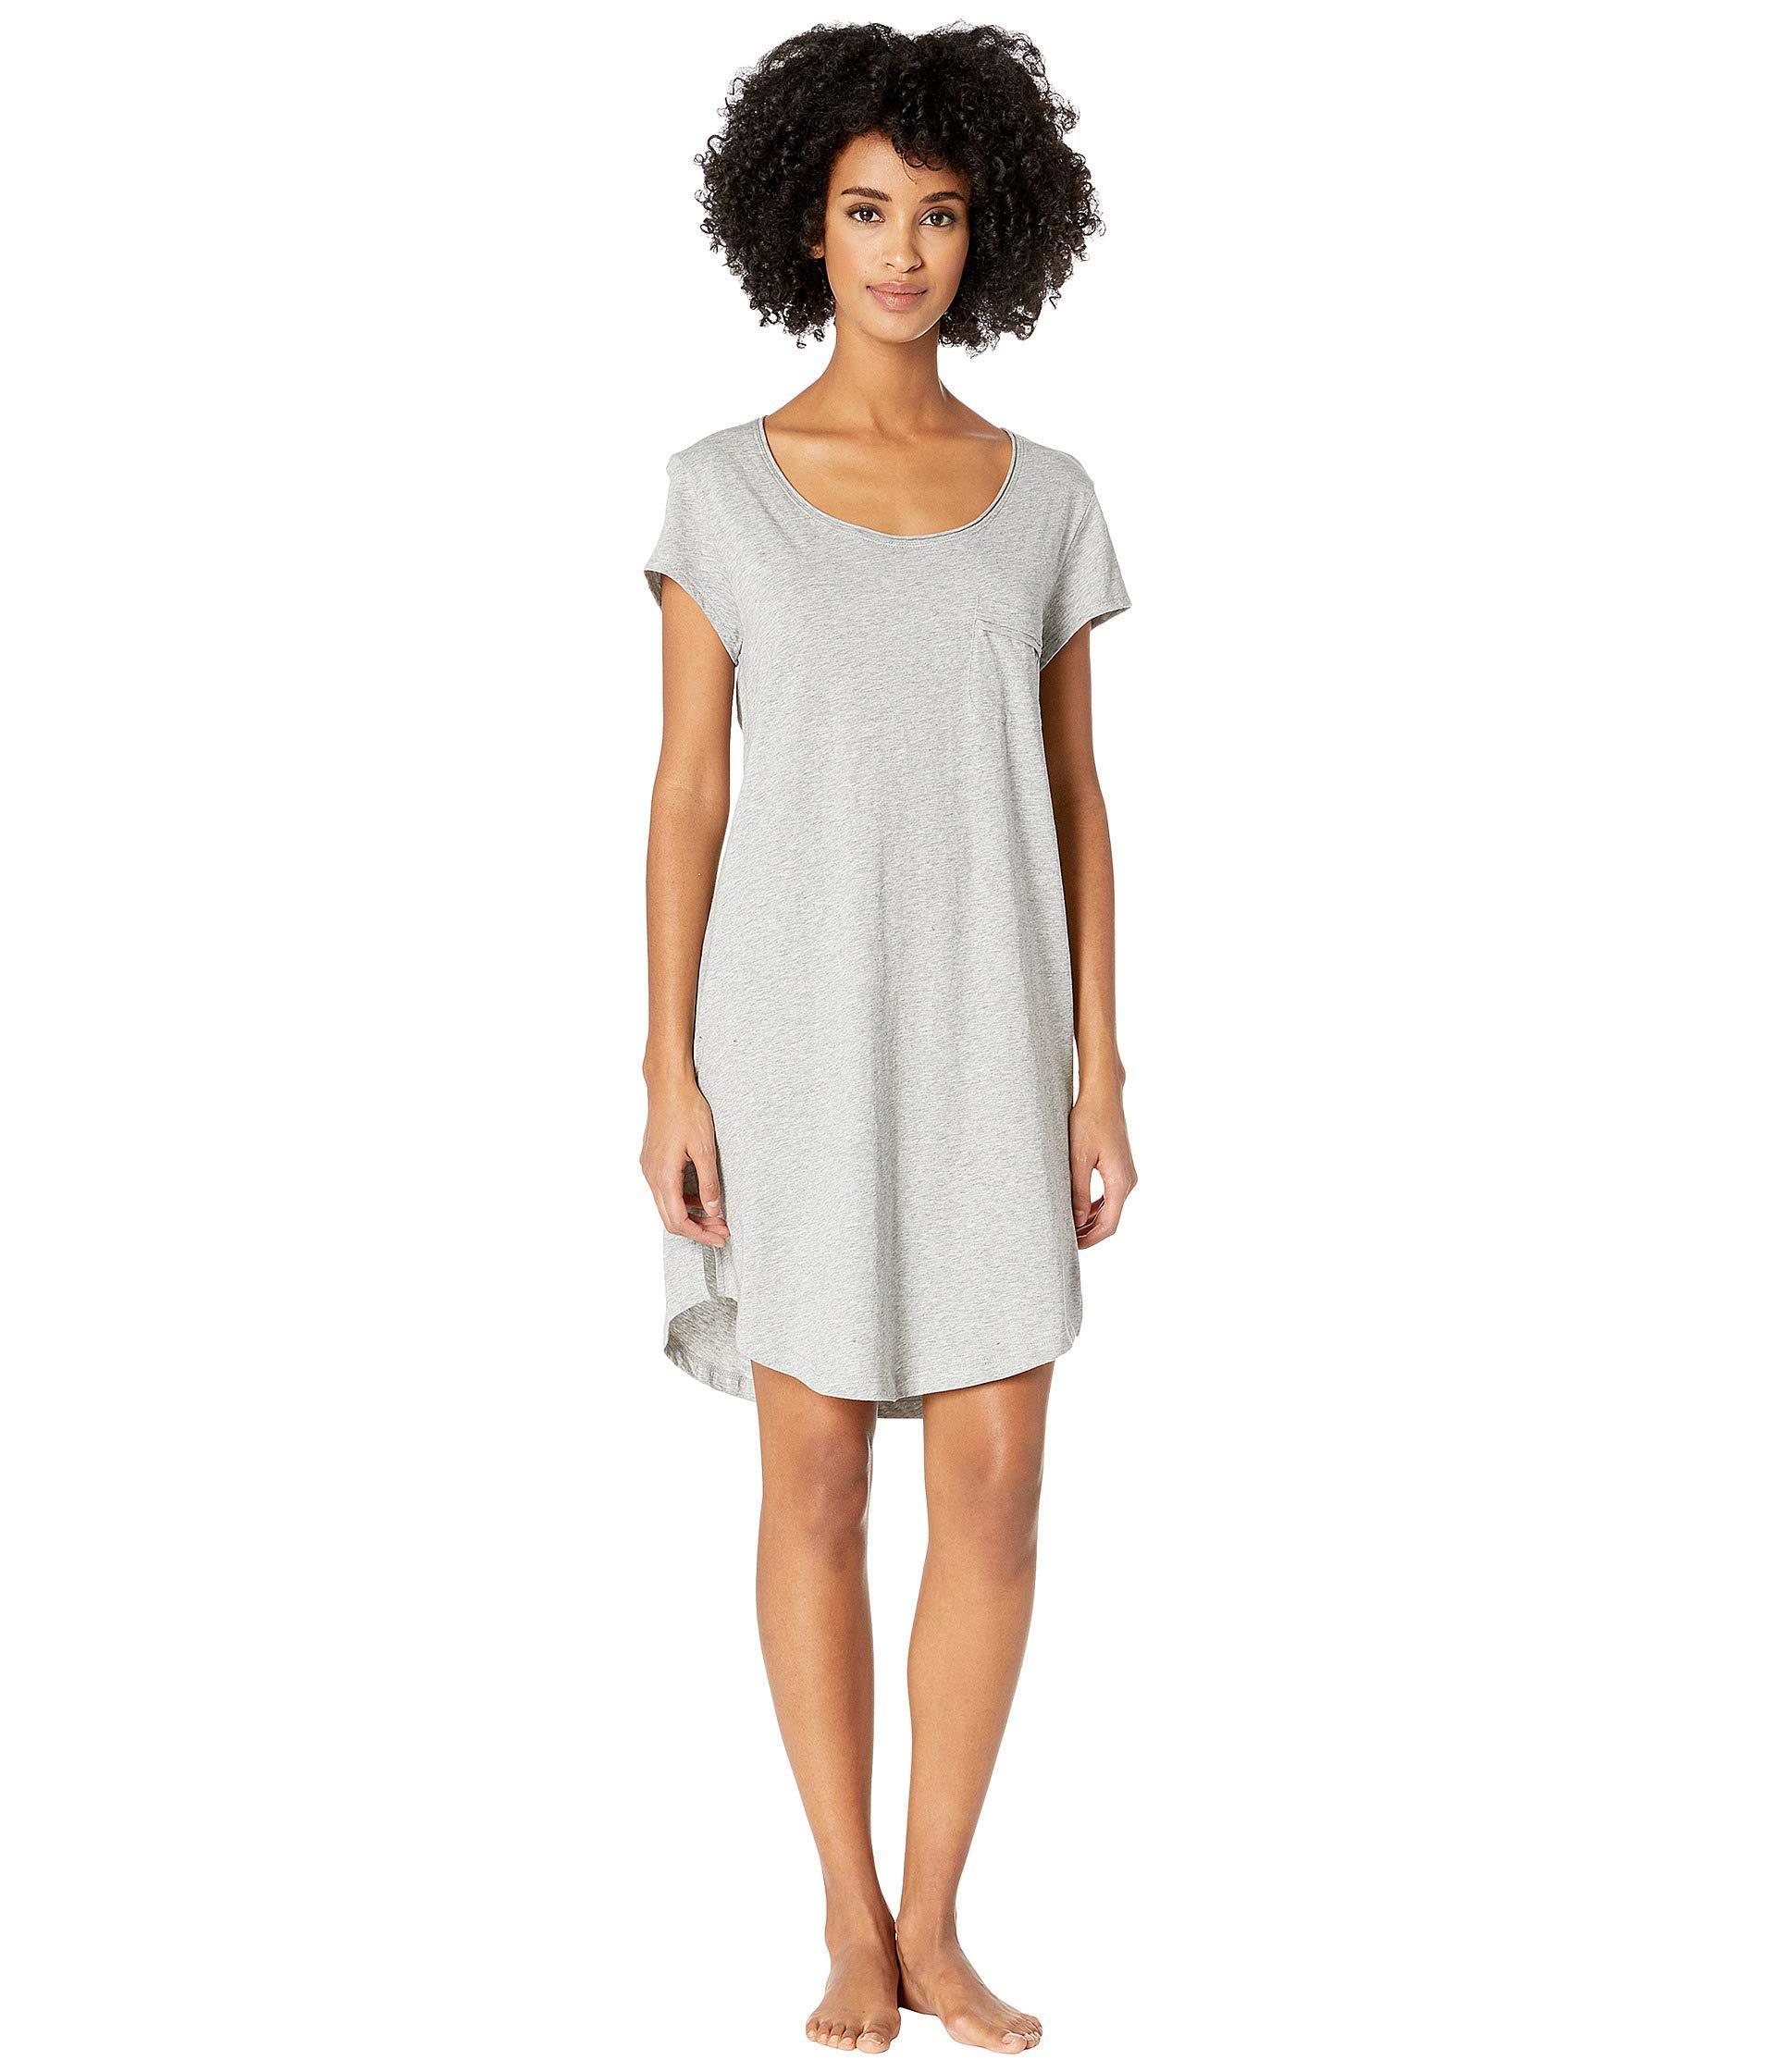 47d4a7b7f6d5a Lyst - Skin 35 Sleep Shirt In Length (heather Grey) Women s Pajama ...